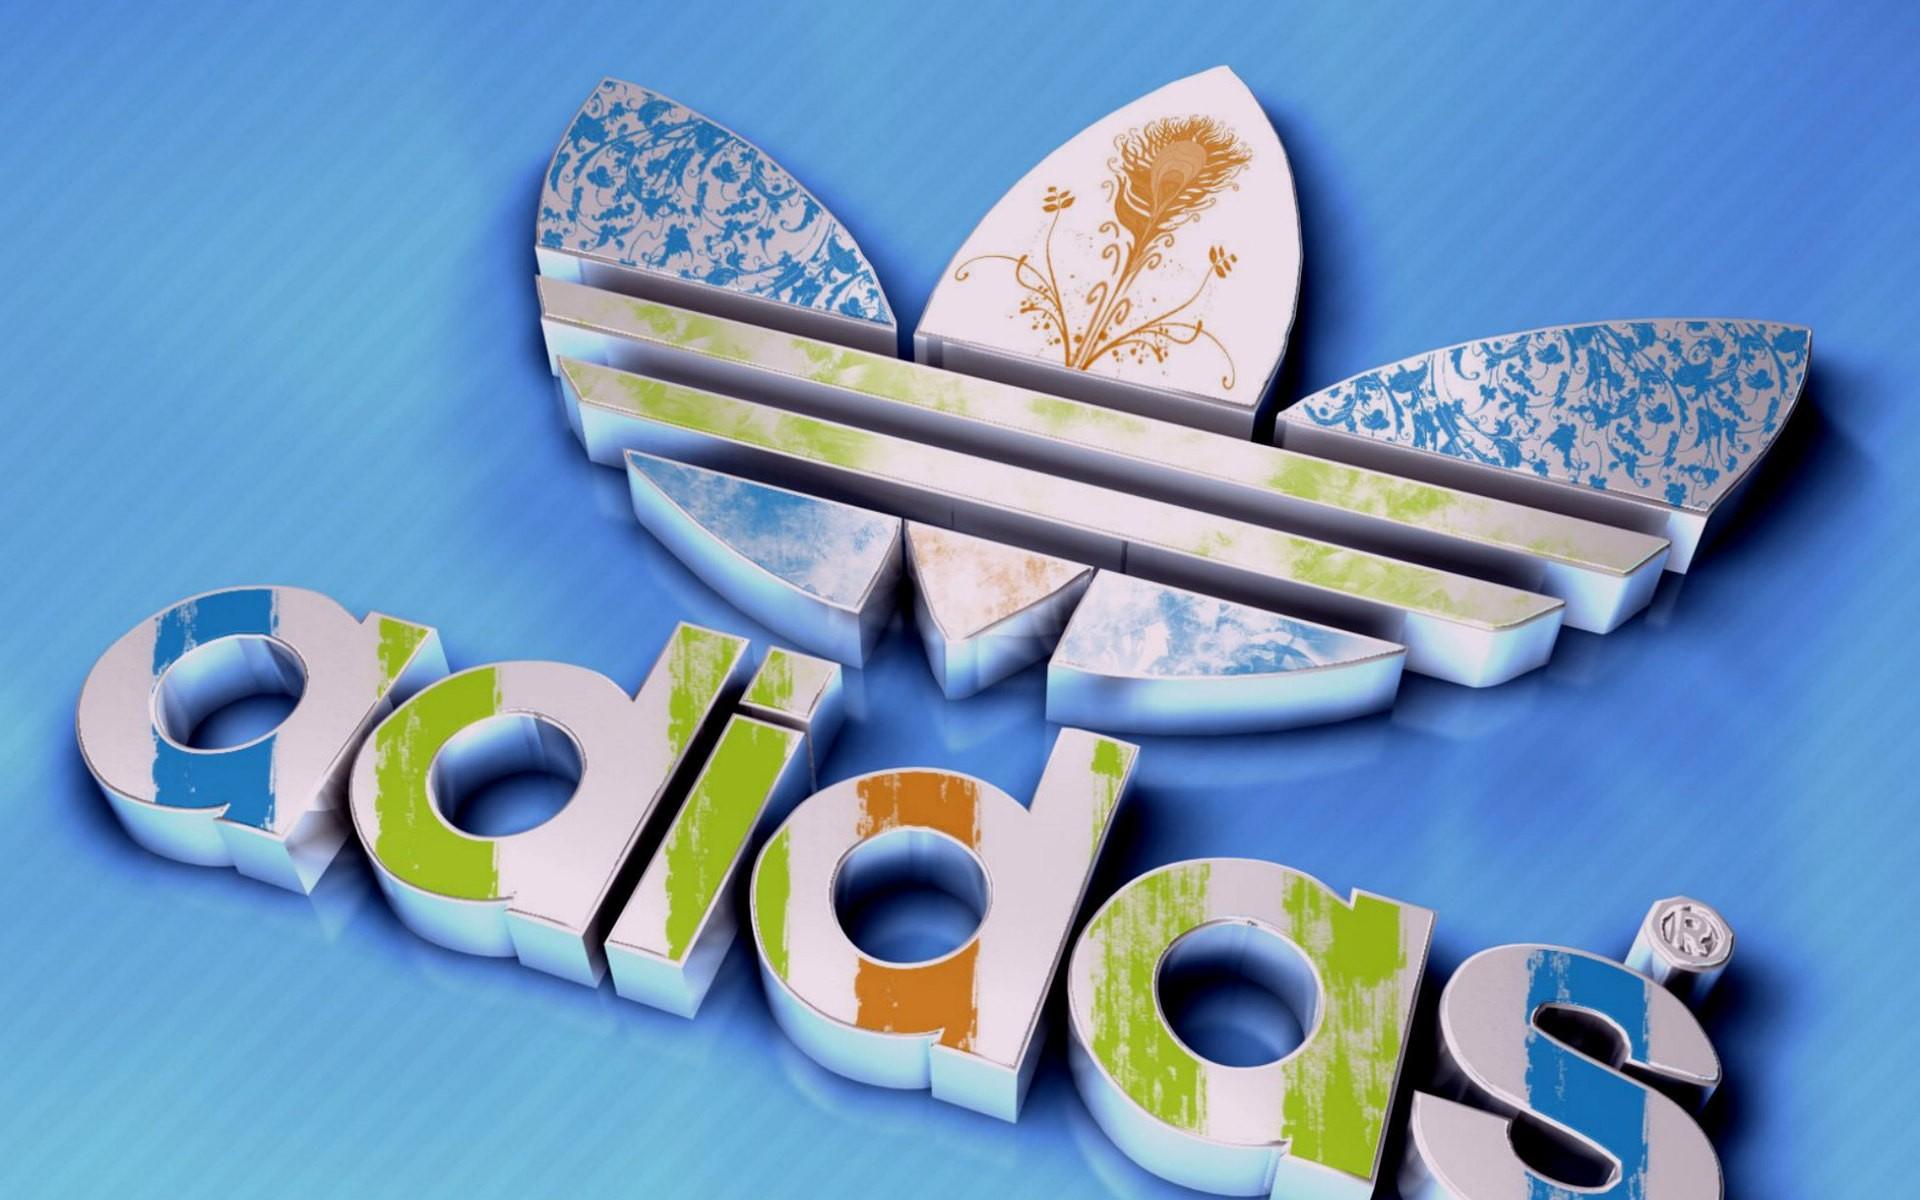 Adidas HD Desktop